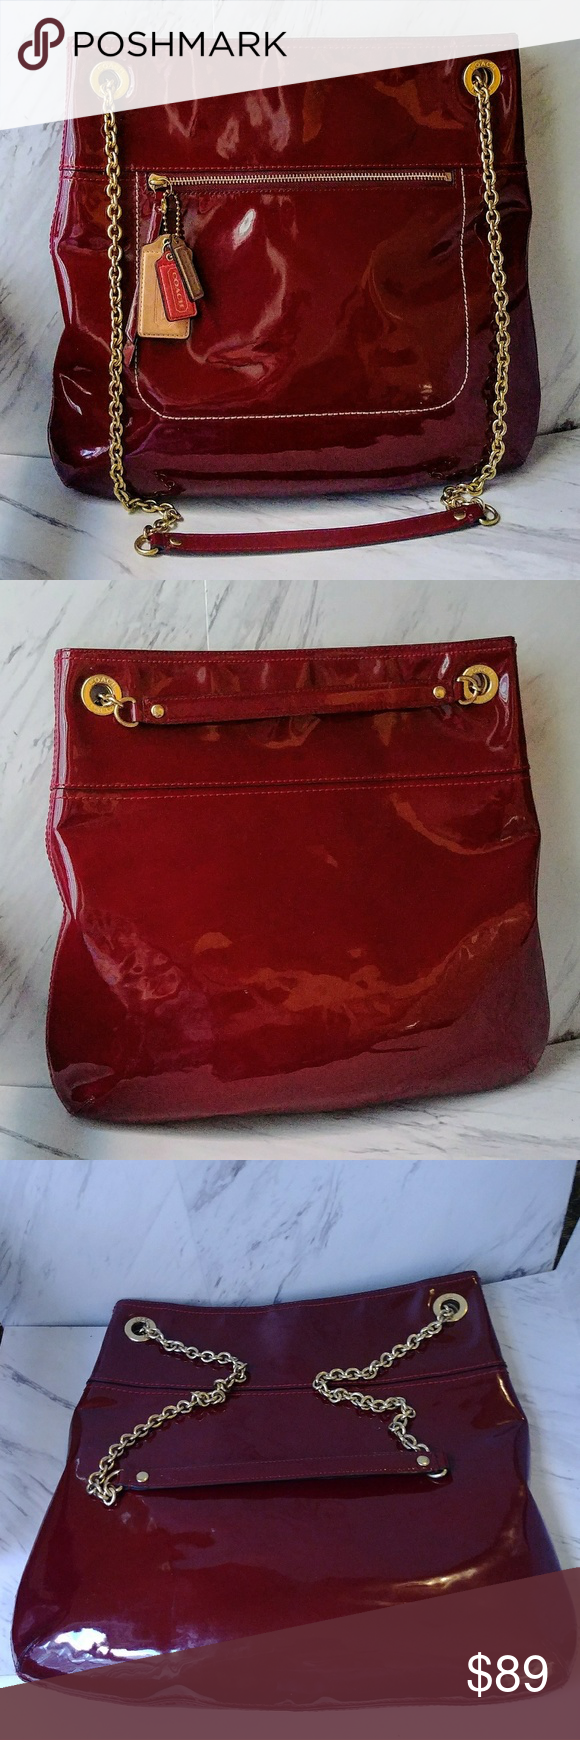 Coach Crimson Patent Leather Handbag